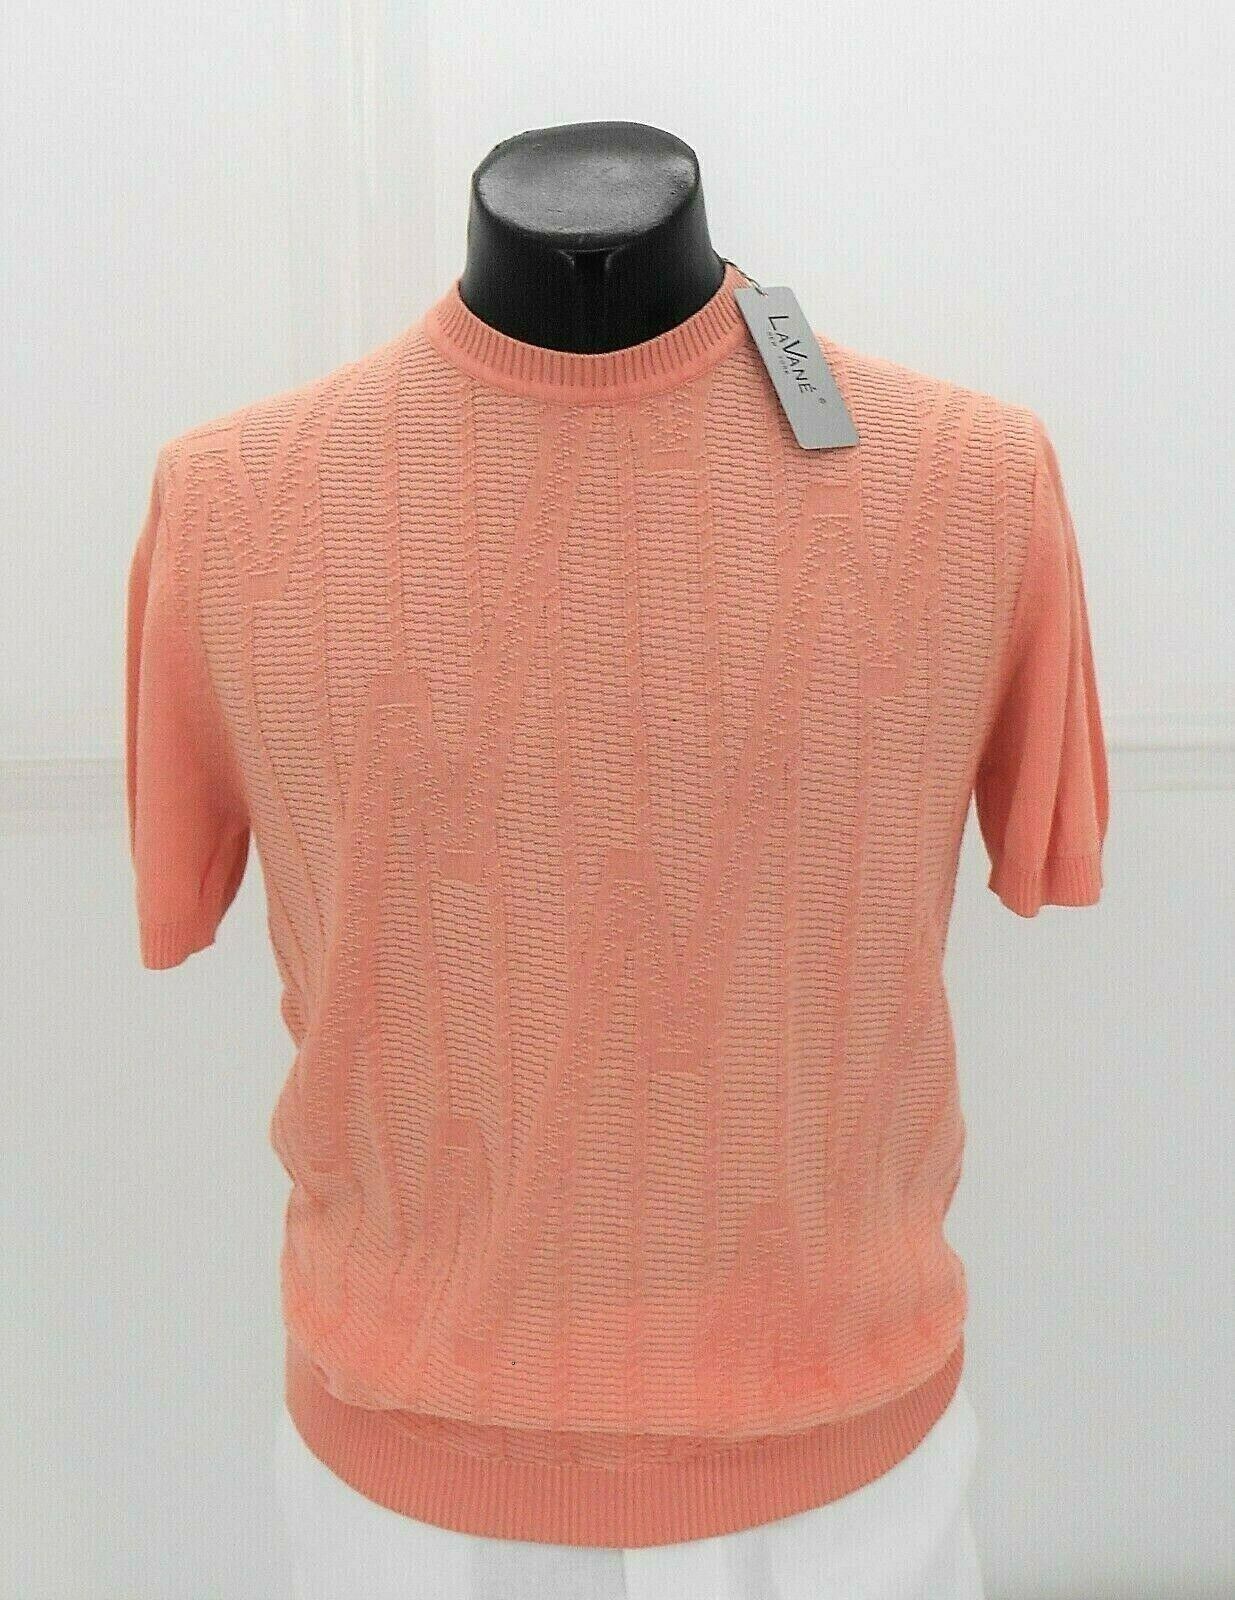 Lavane Men's Peach Light Weight Short Sleeve Sweater